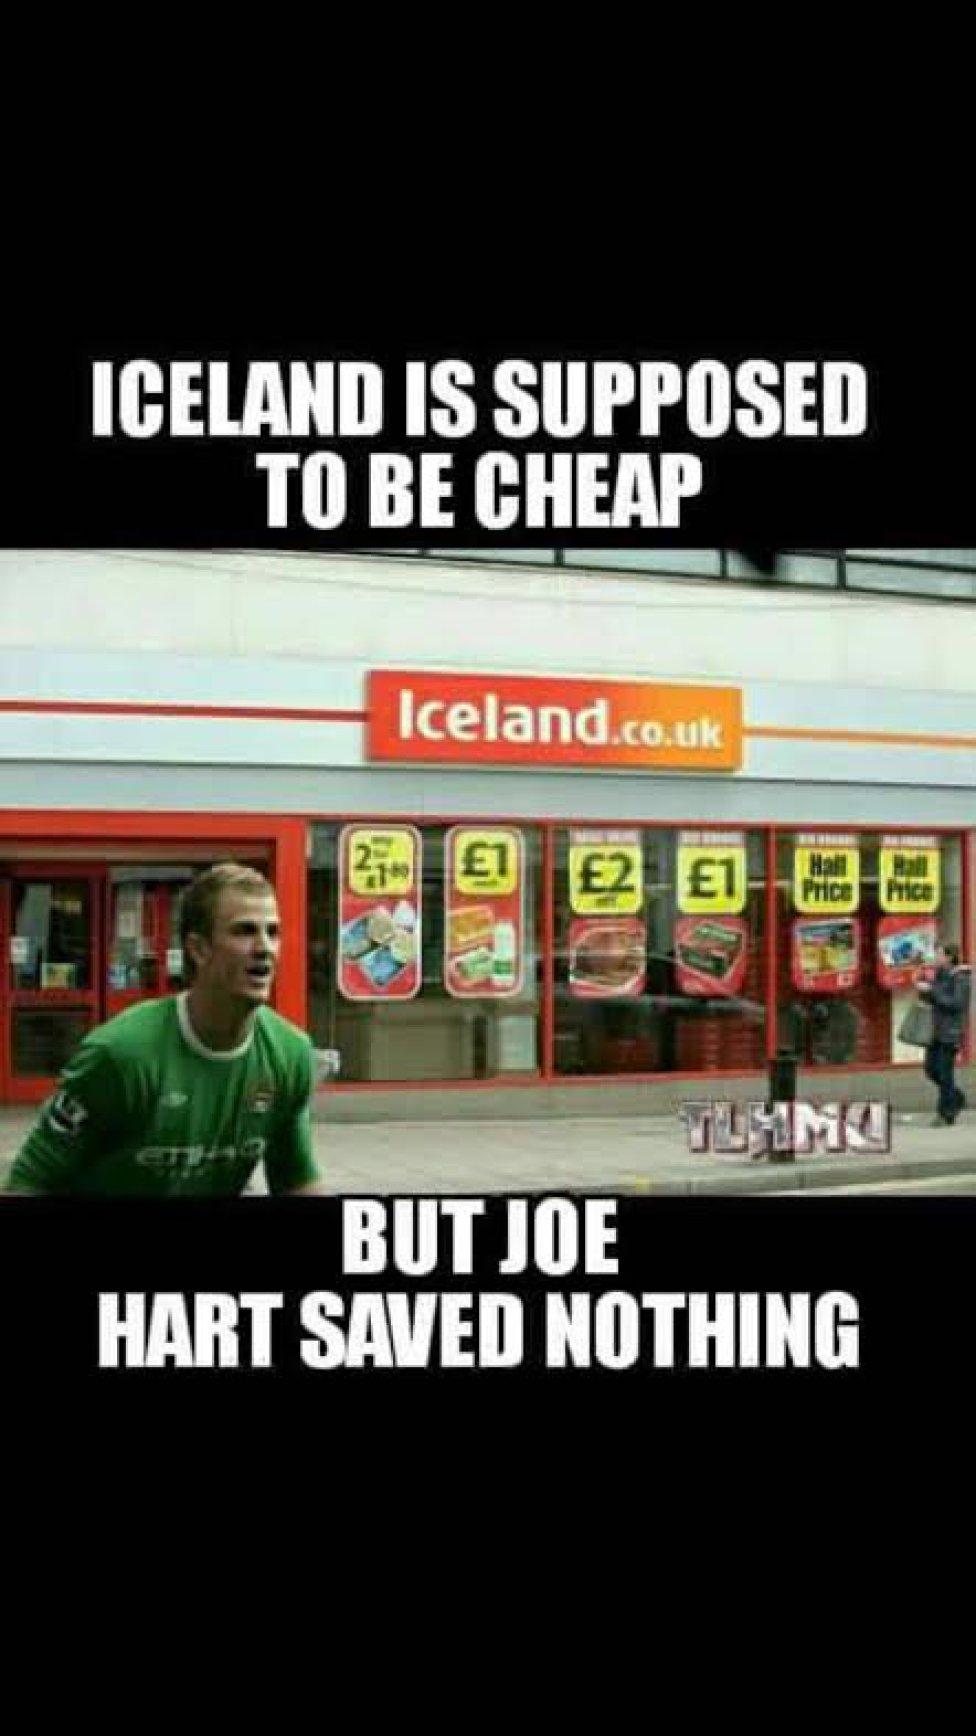 1467068115_394033_1467068239_album_grande england freeze against iceland memes, jokes, quips, cracks, pics